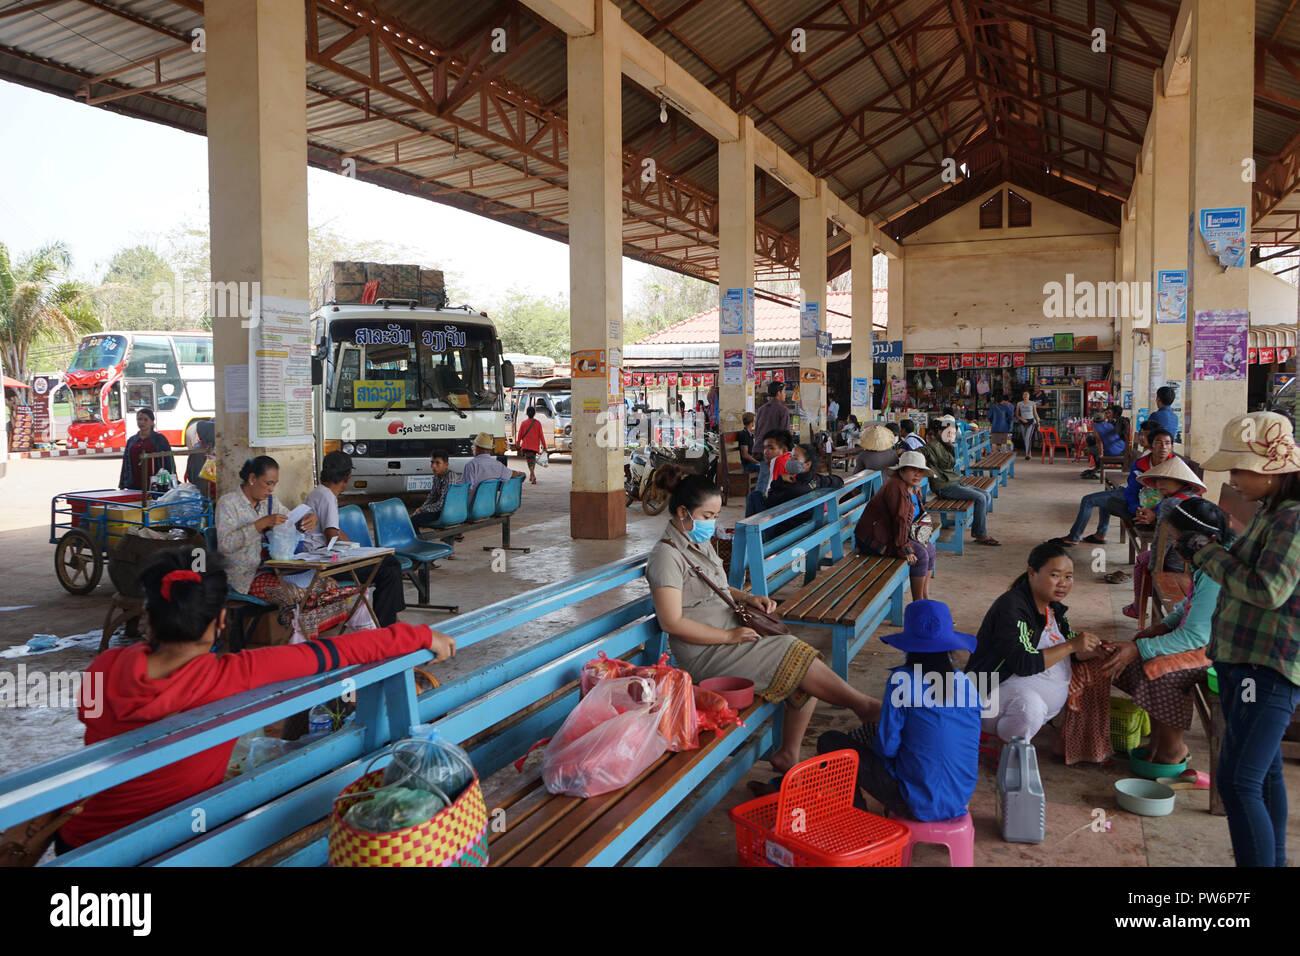 Busbahnhof, Pakxe, Pakse, Provinz Champasak, Sued-Laos, Laos, Asien - Stock Image